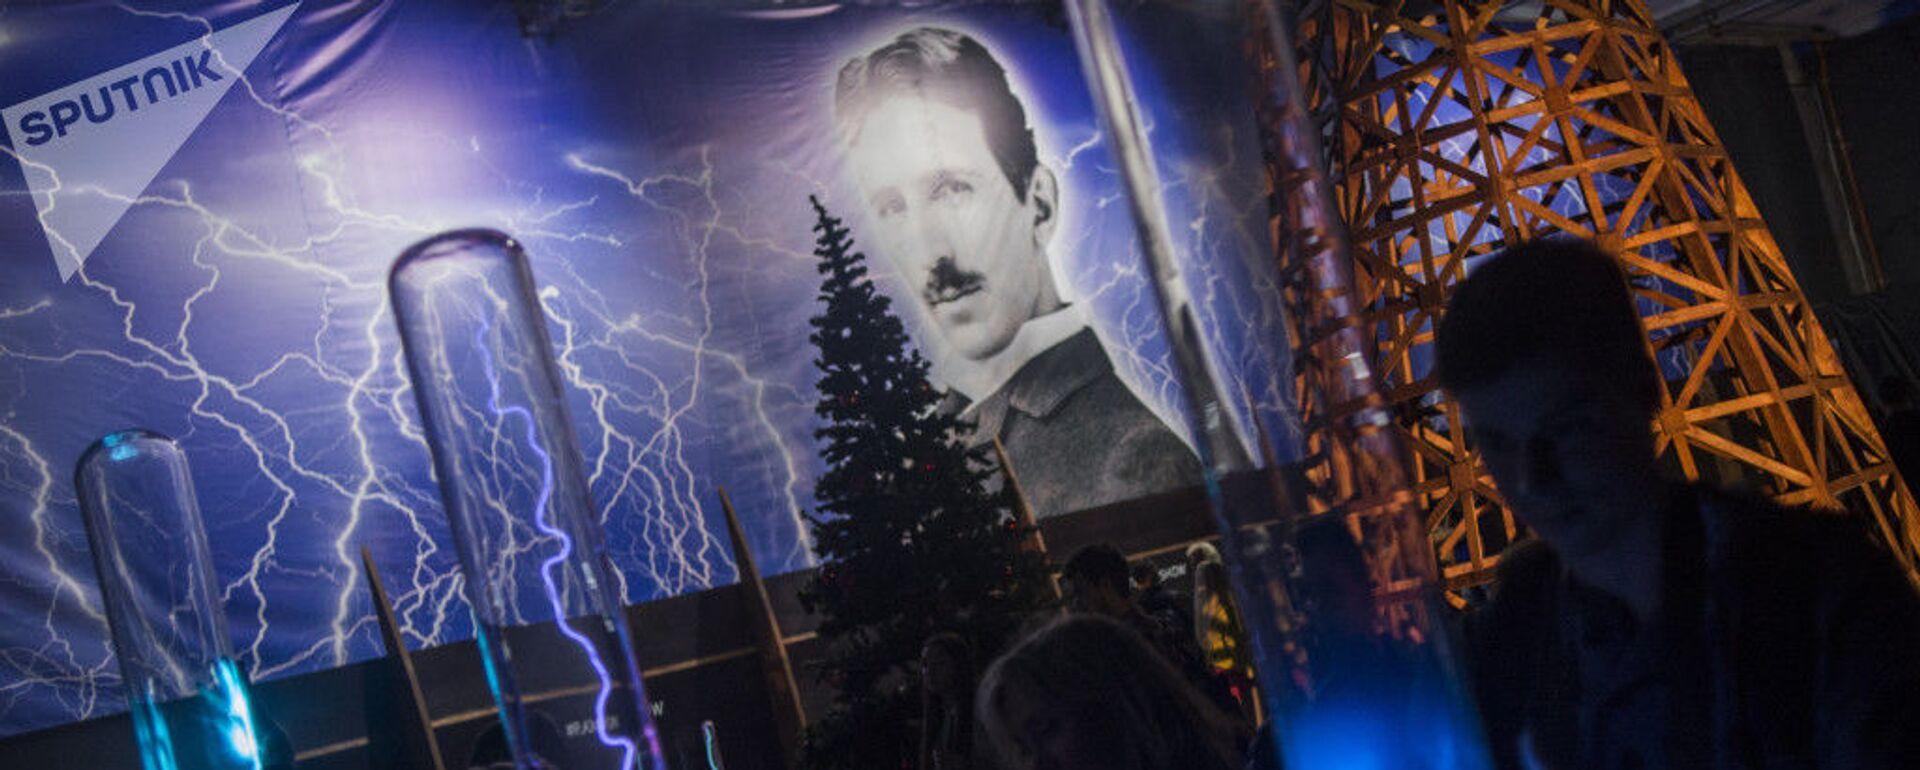 Никола Тесла: Прослава 160. годишњице у Москви - Sputnik Србија, 1920, 18.05.2021